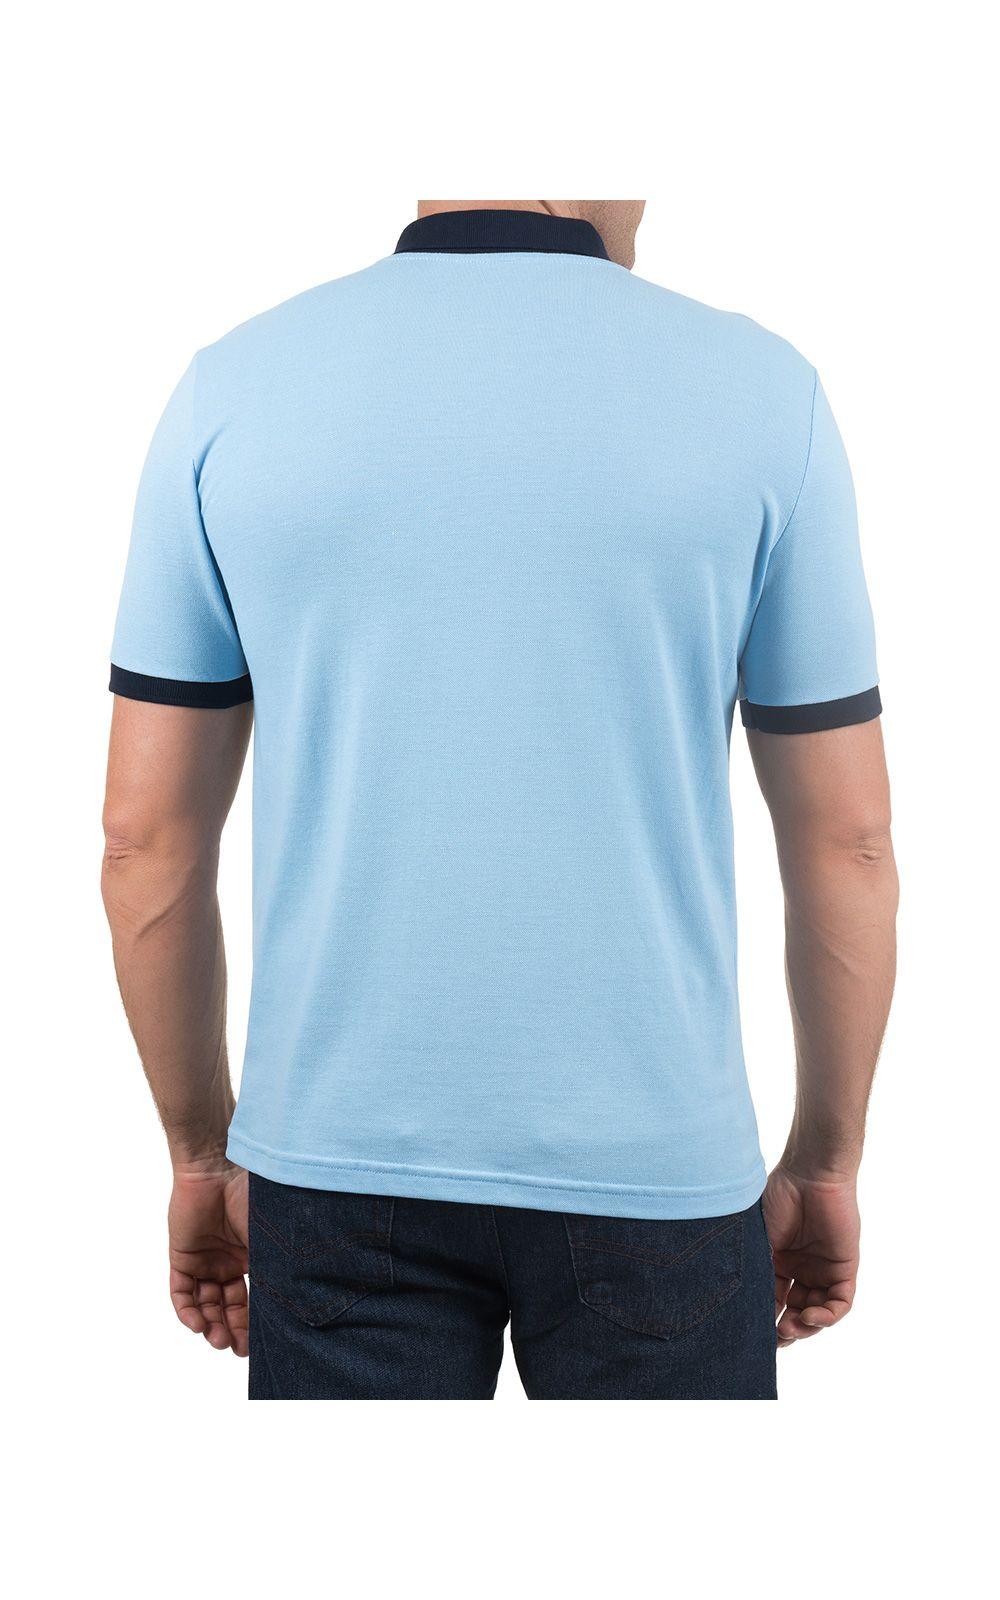 Foto 2 - Camisa Polo Masculina Azul Lisa